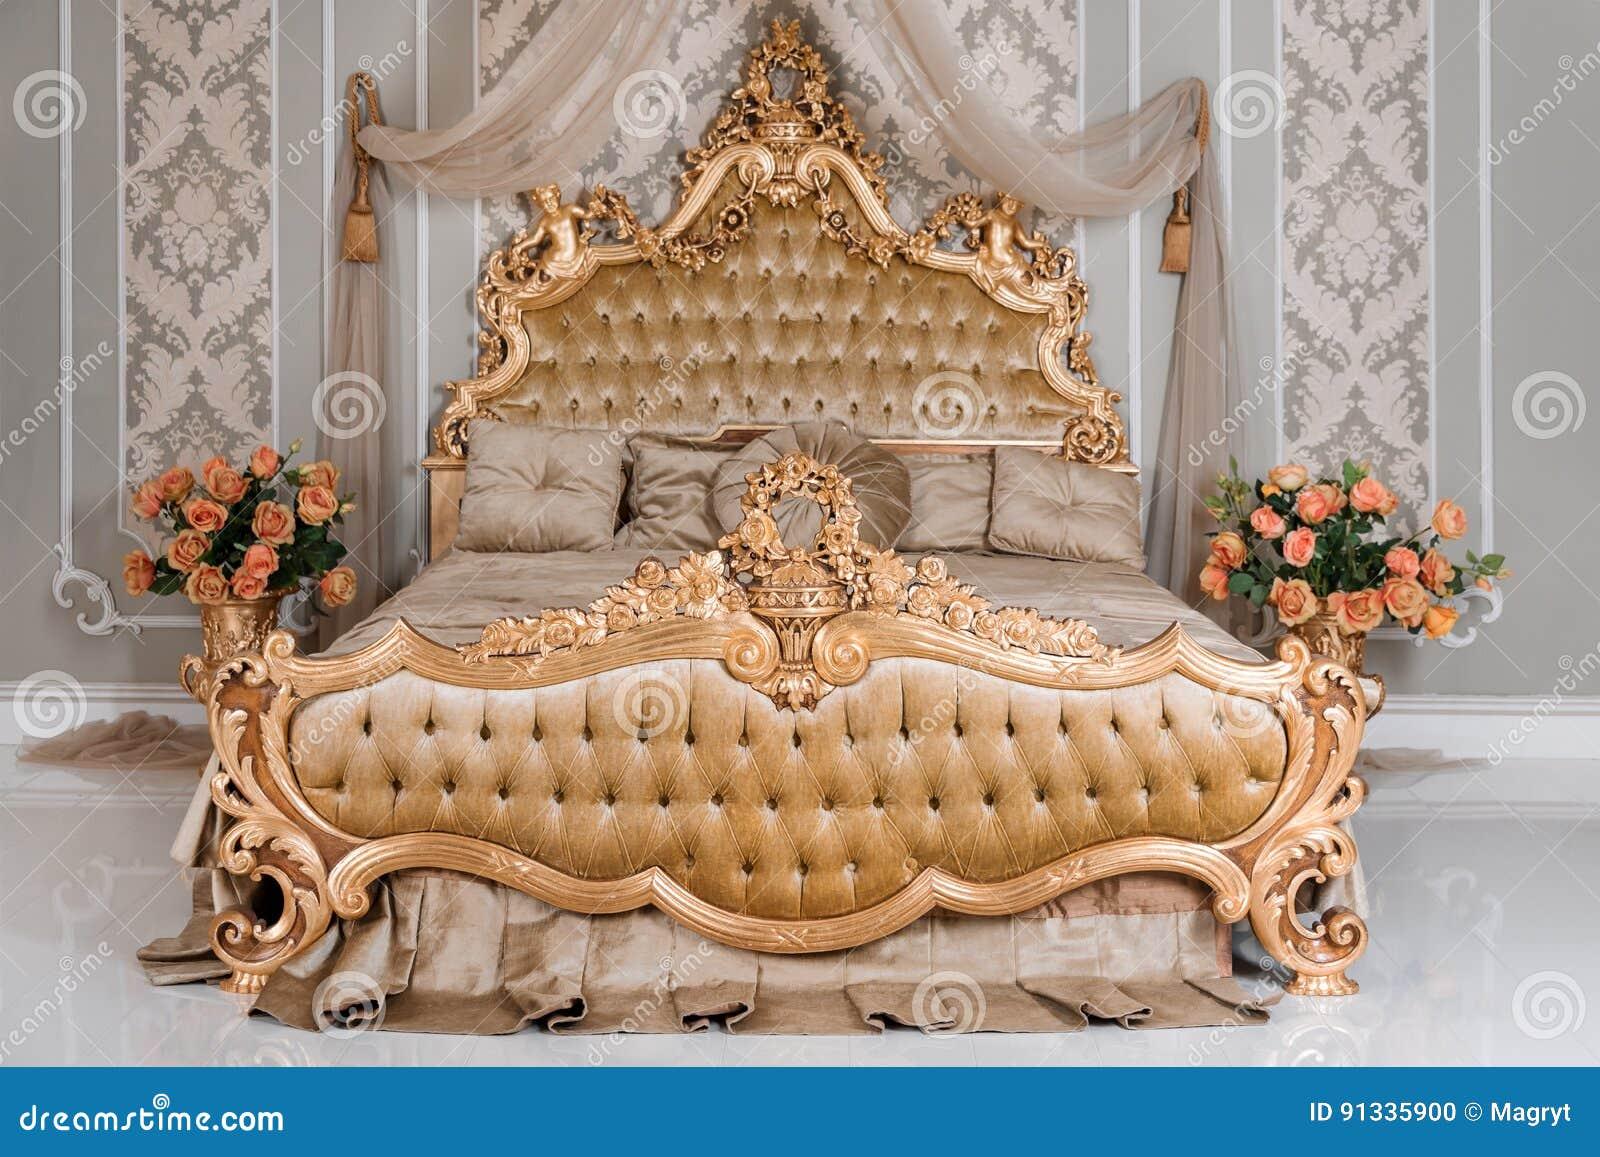 royal furniture in luxury interior stock photo 21316770. Black Bedroom Furniture Sets. Home Design Ideas